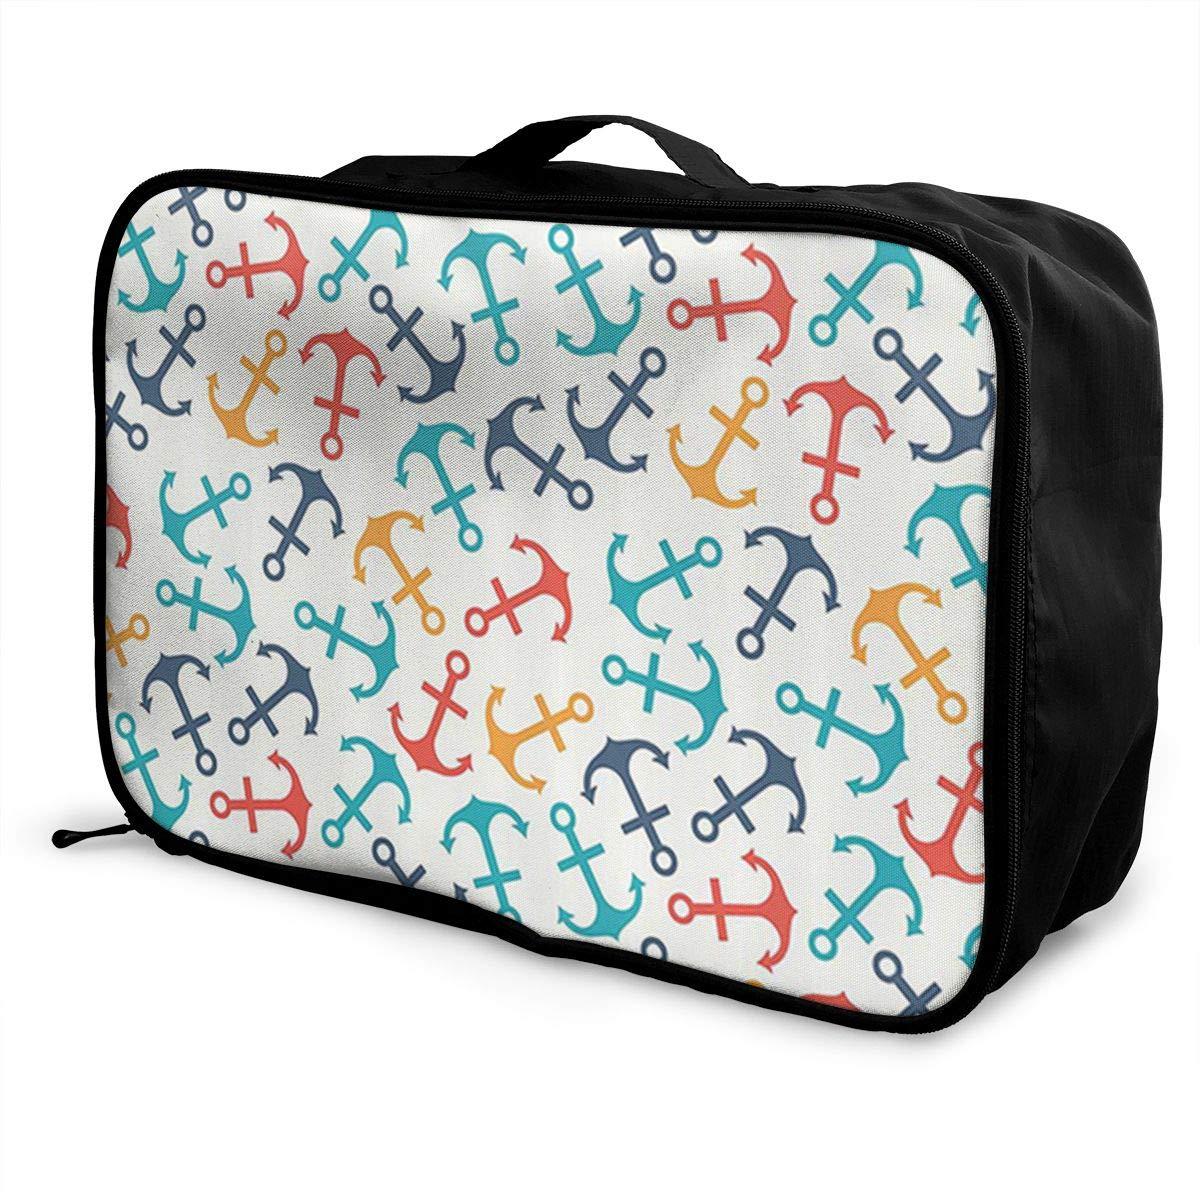 Anchor Shape in Lines Tropics Getaway Transport Decorative Canvas Travel Weekender Bag,Fashion Custom Lightweight Large Capacity Portable Luggage Bag,Suitcase Trolley Bag